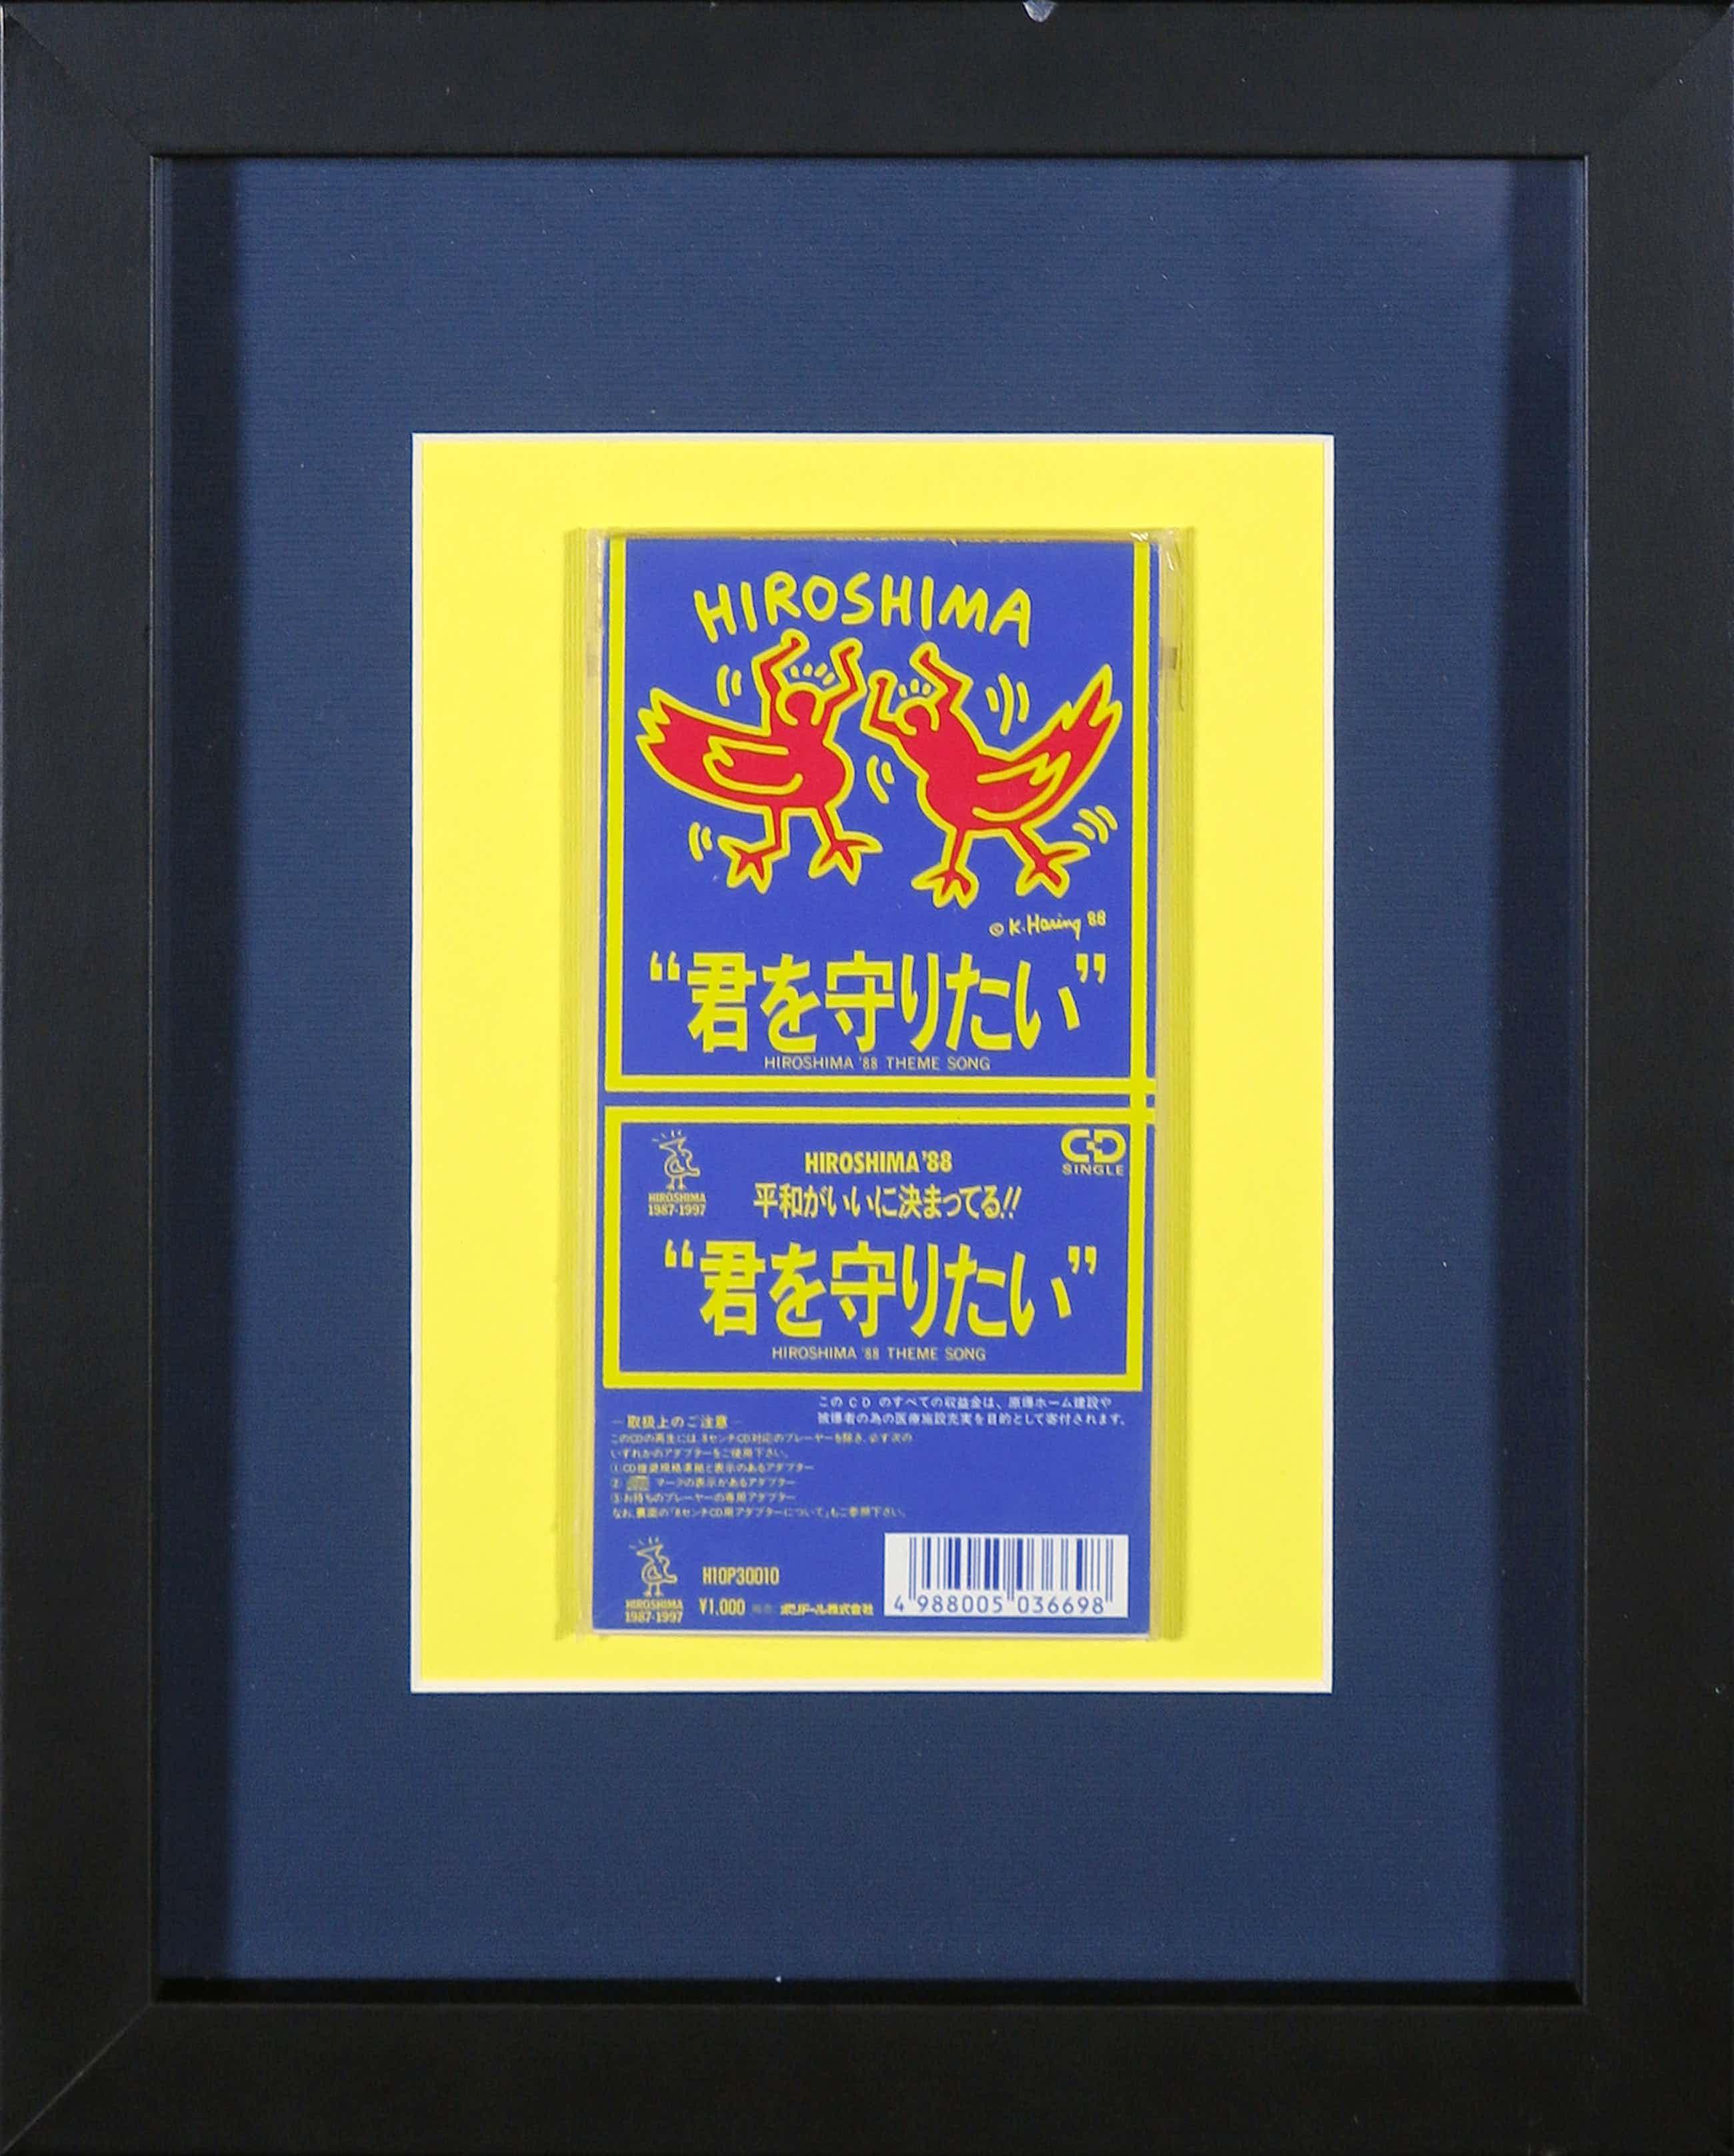 Keith Haring - CD Single - Peace Birds '88 All Stars – 君を守りたい kopen? Bied vanaf 70!